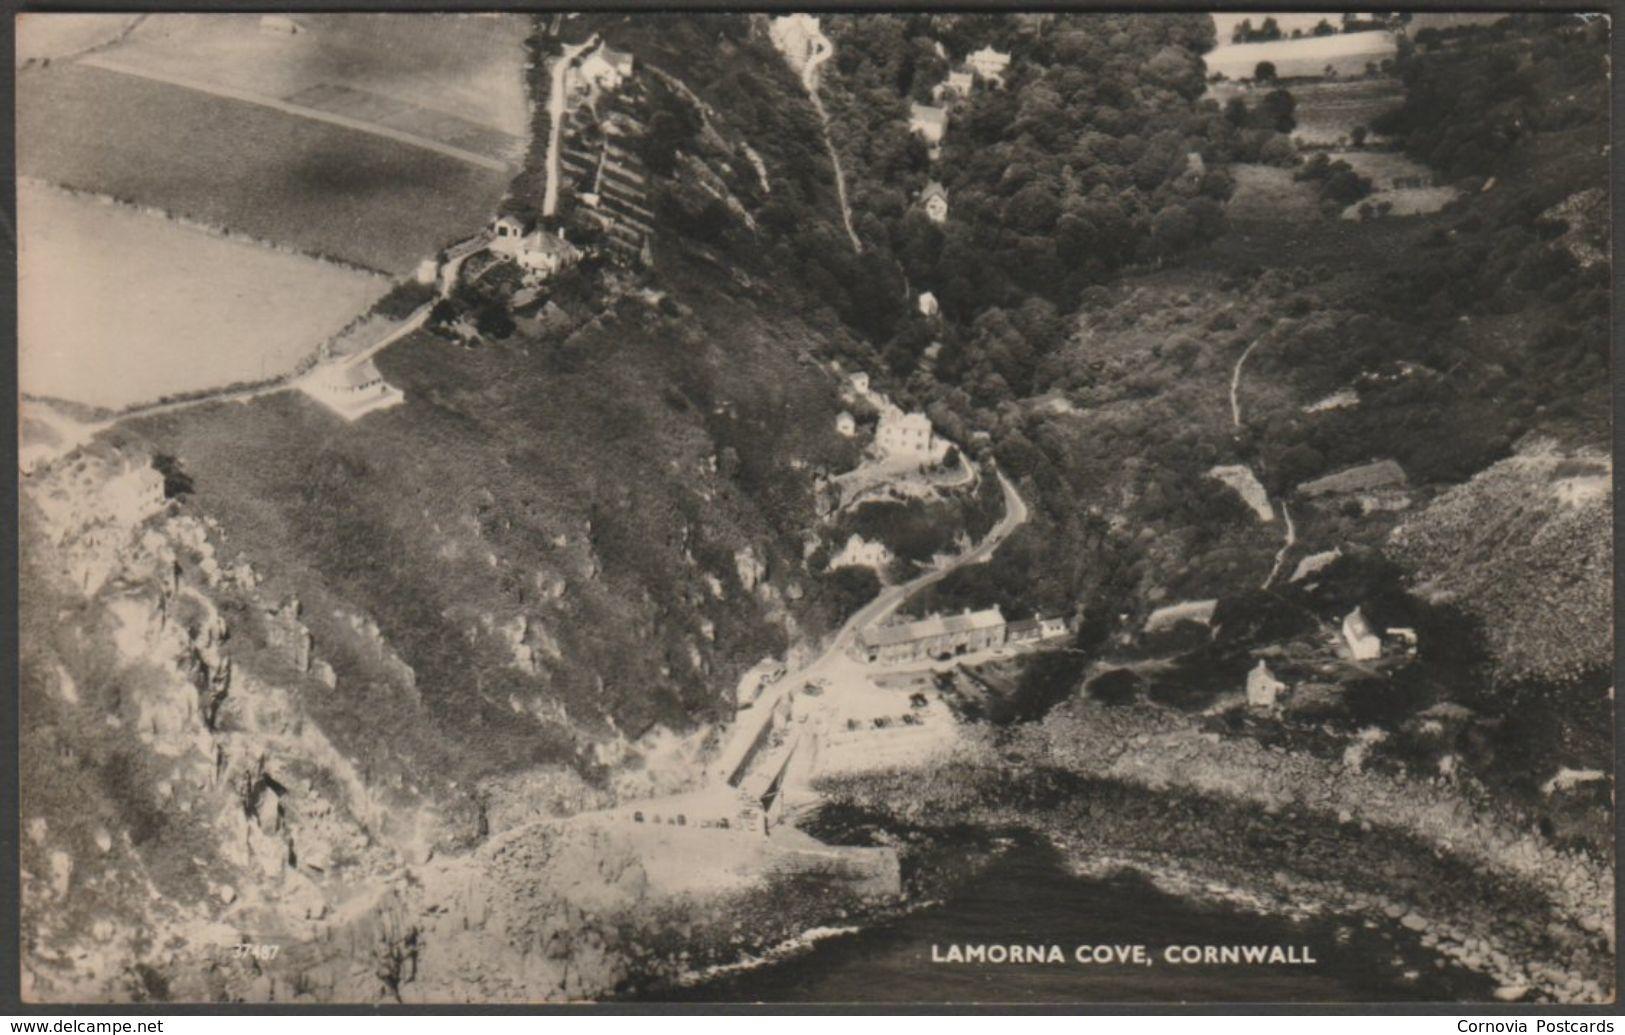 Lamorna Cove, Cornwall, c.1950 - Aero Pictorial RP Postcard